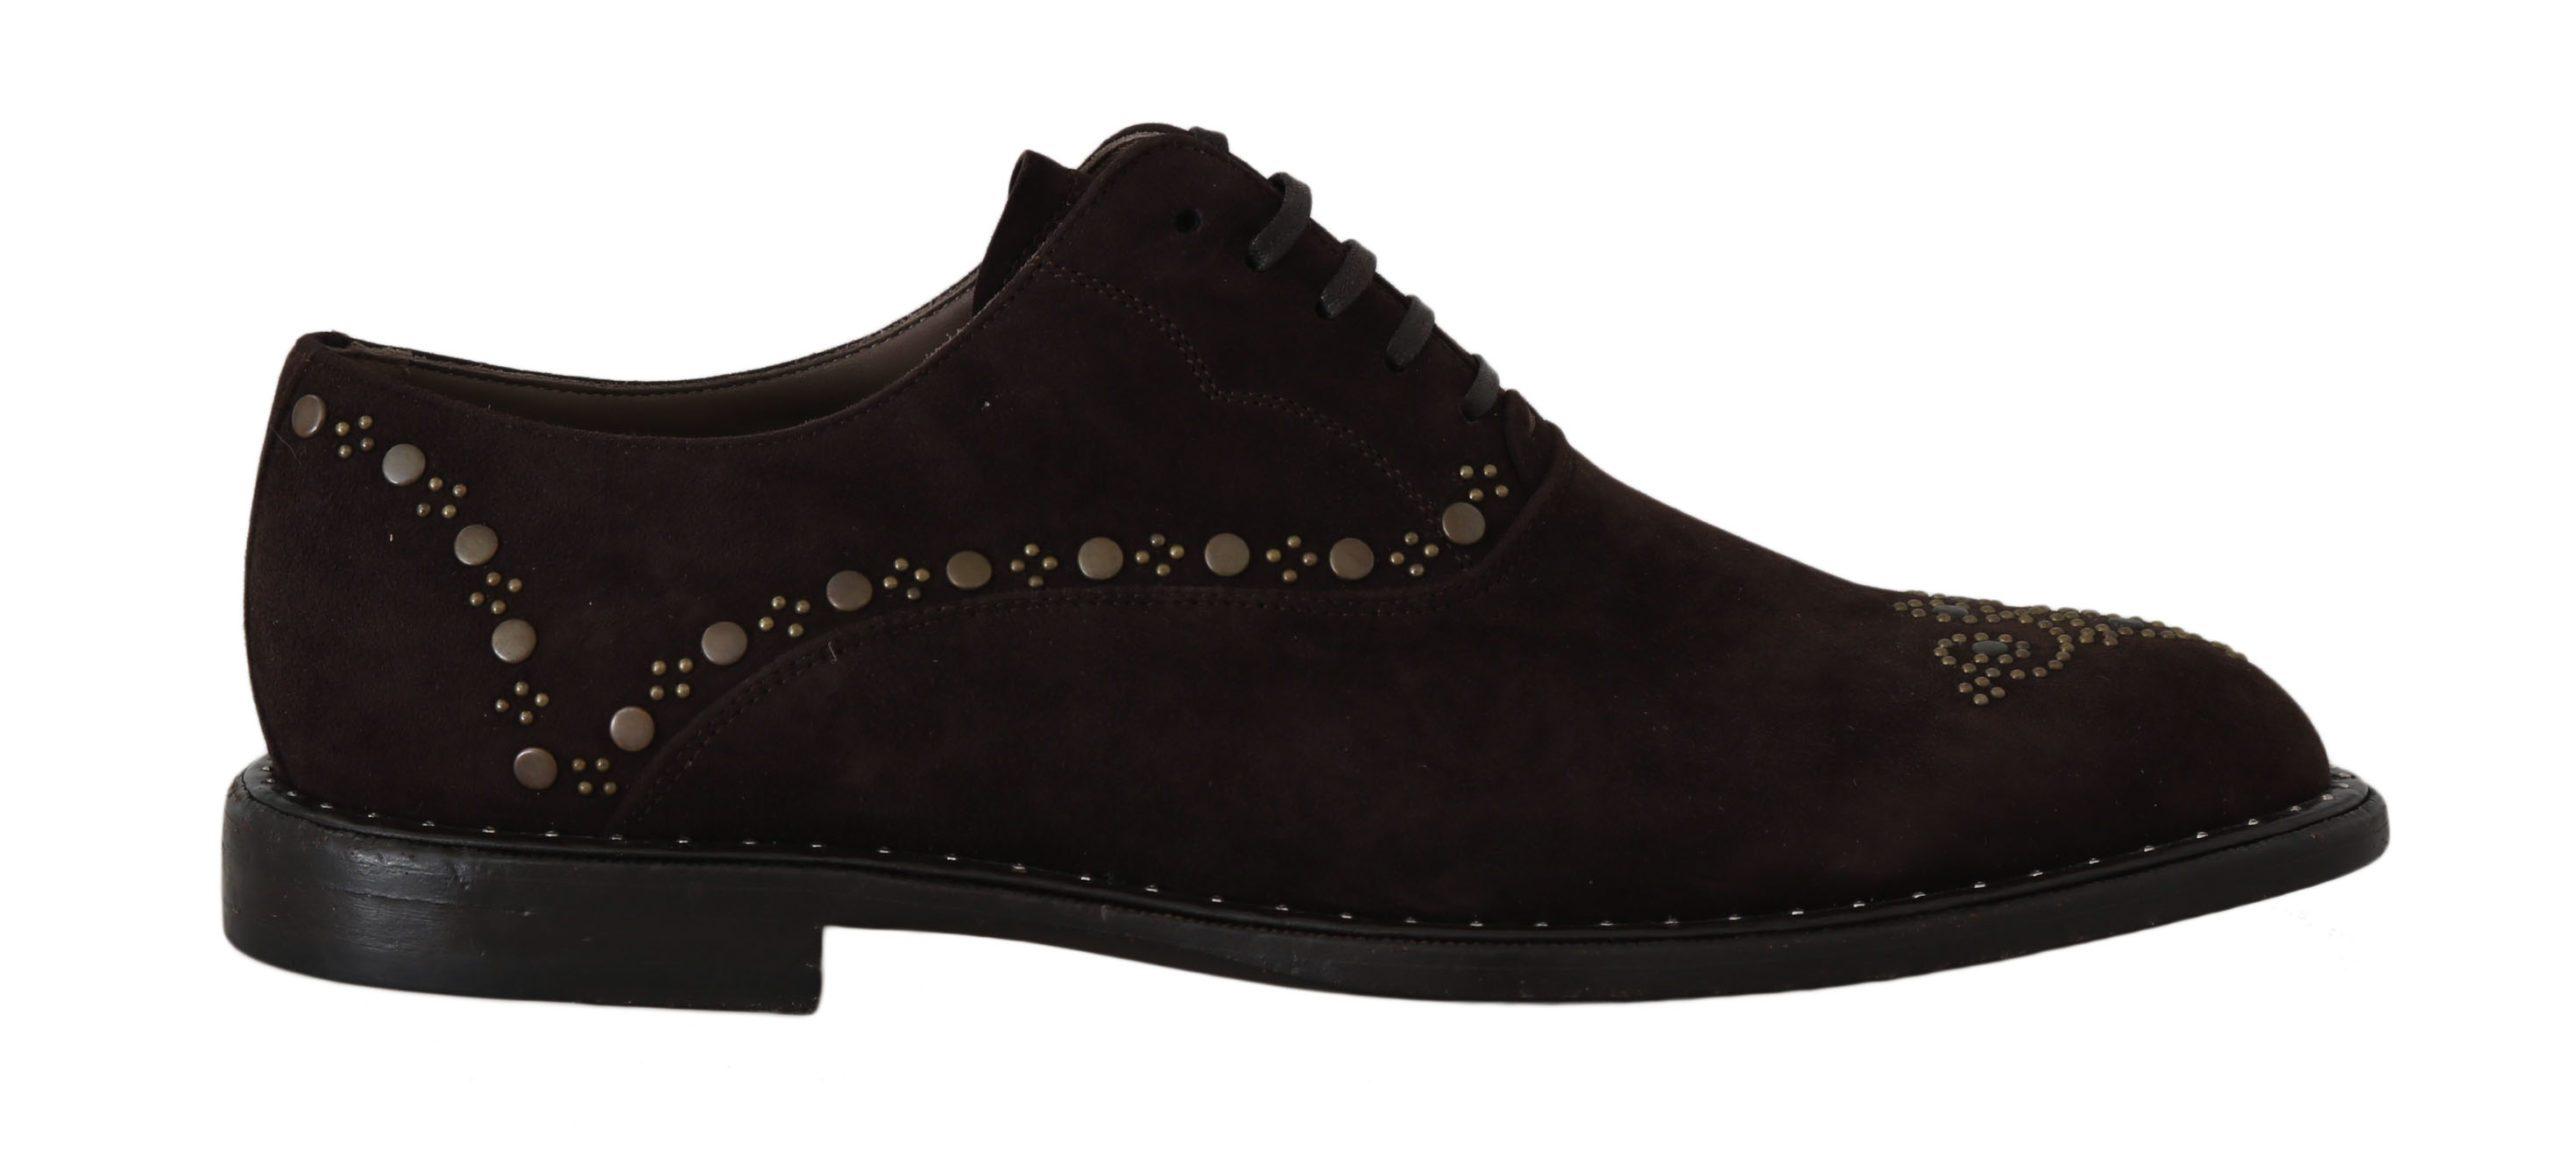 Dolce & Gabbana Men's Suede Marsala Derby Studded Shoes Brown MV2187 - EU39/US6